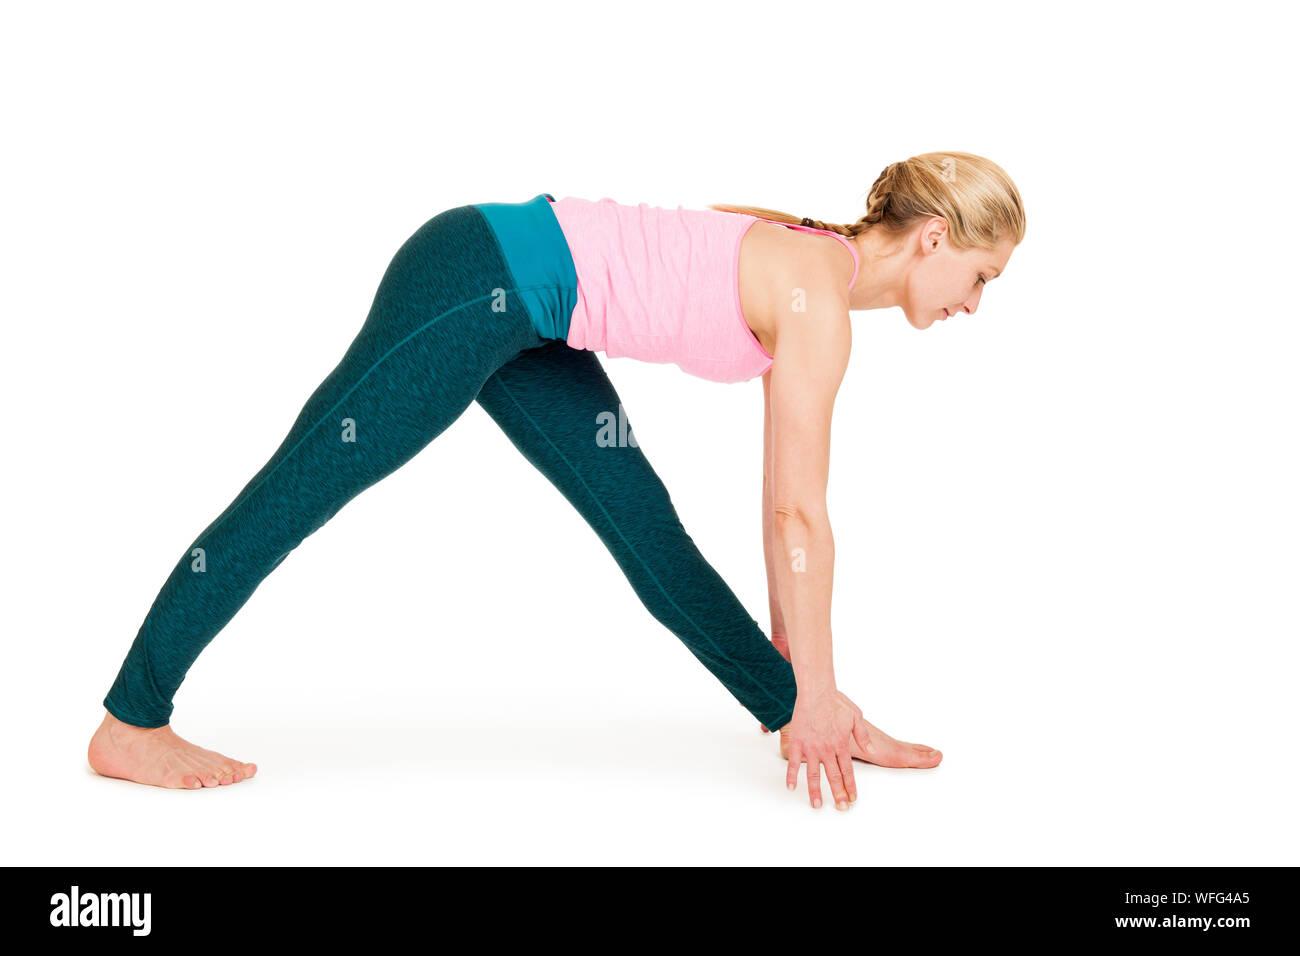 Full Length Of Woman Exercising Against White Background Stock Photo